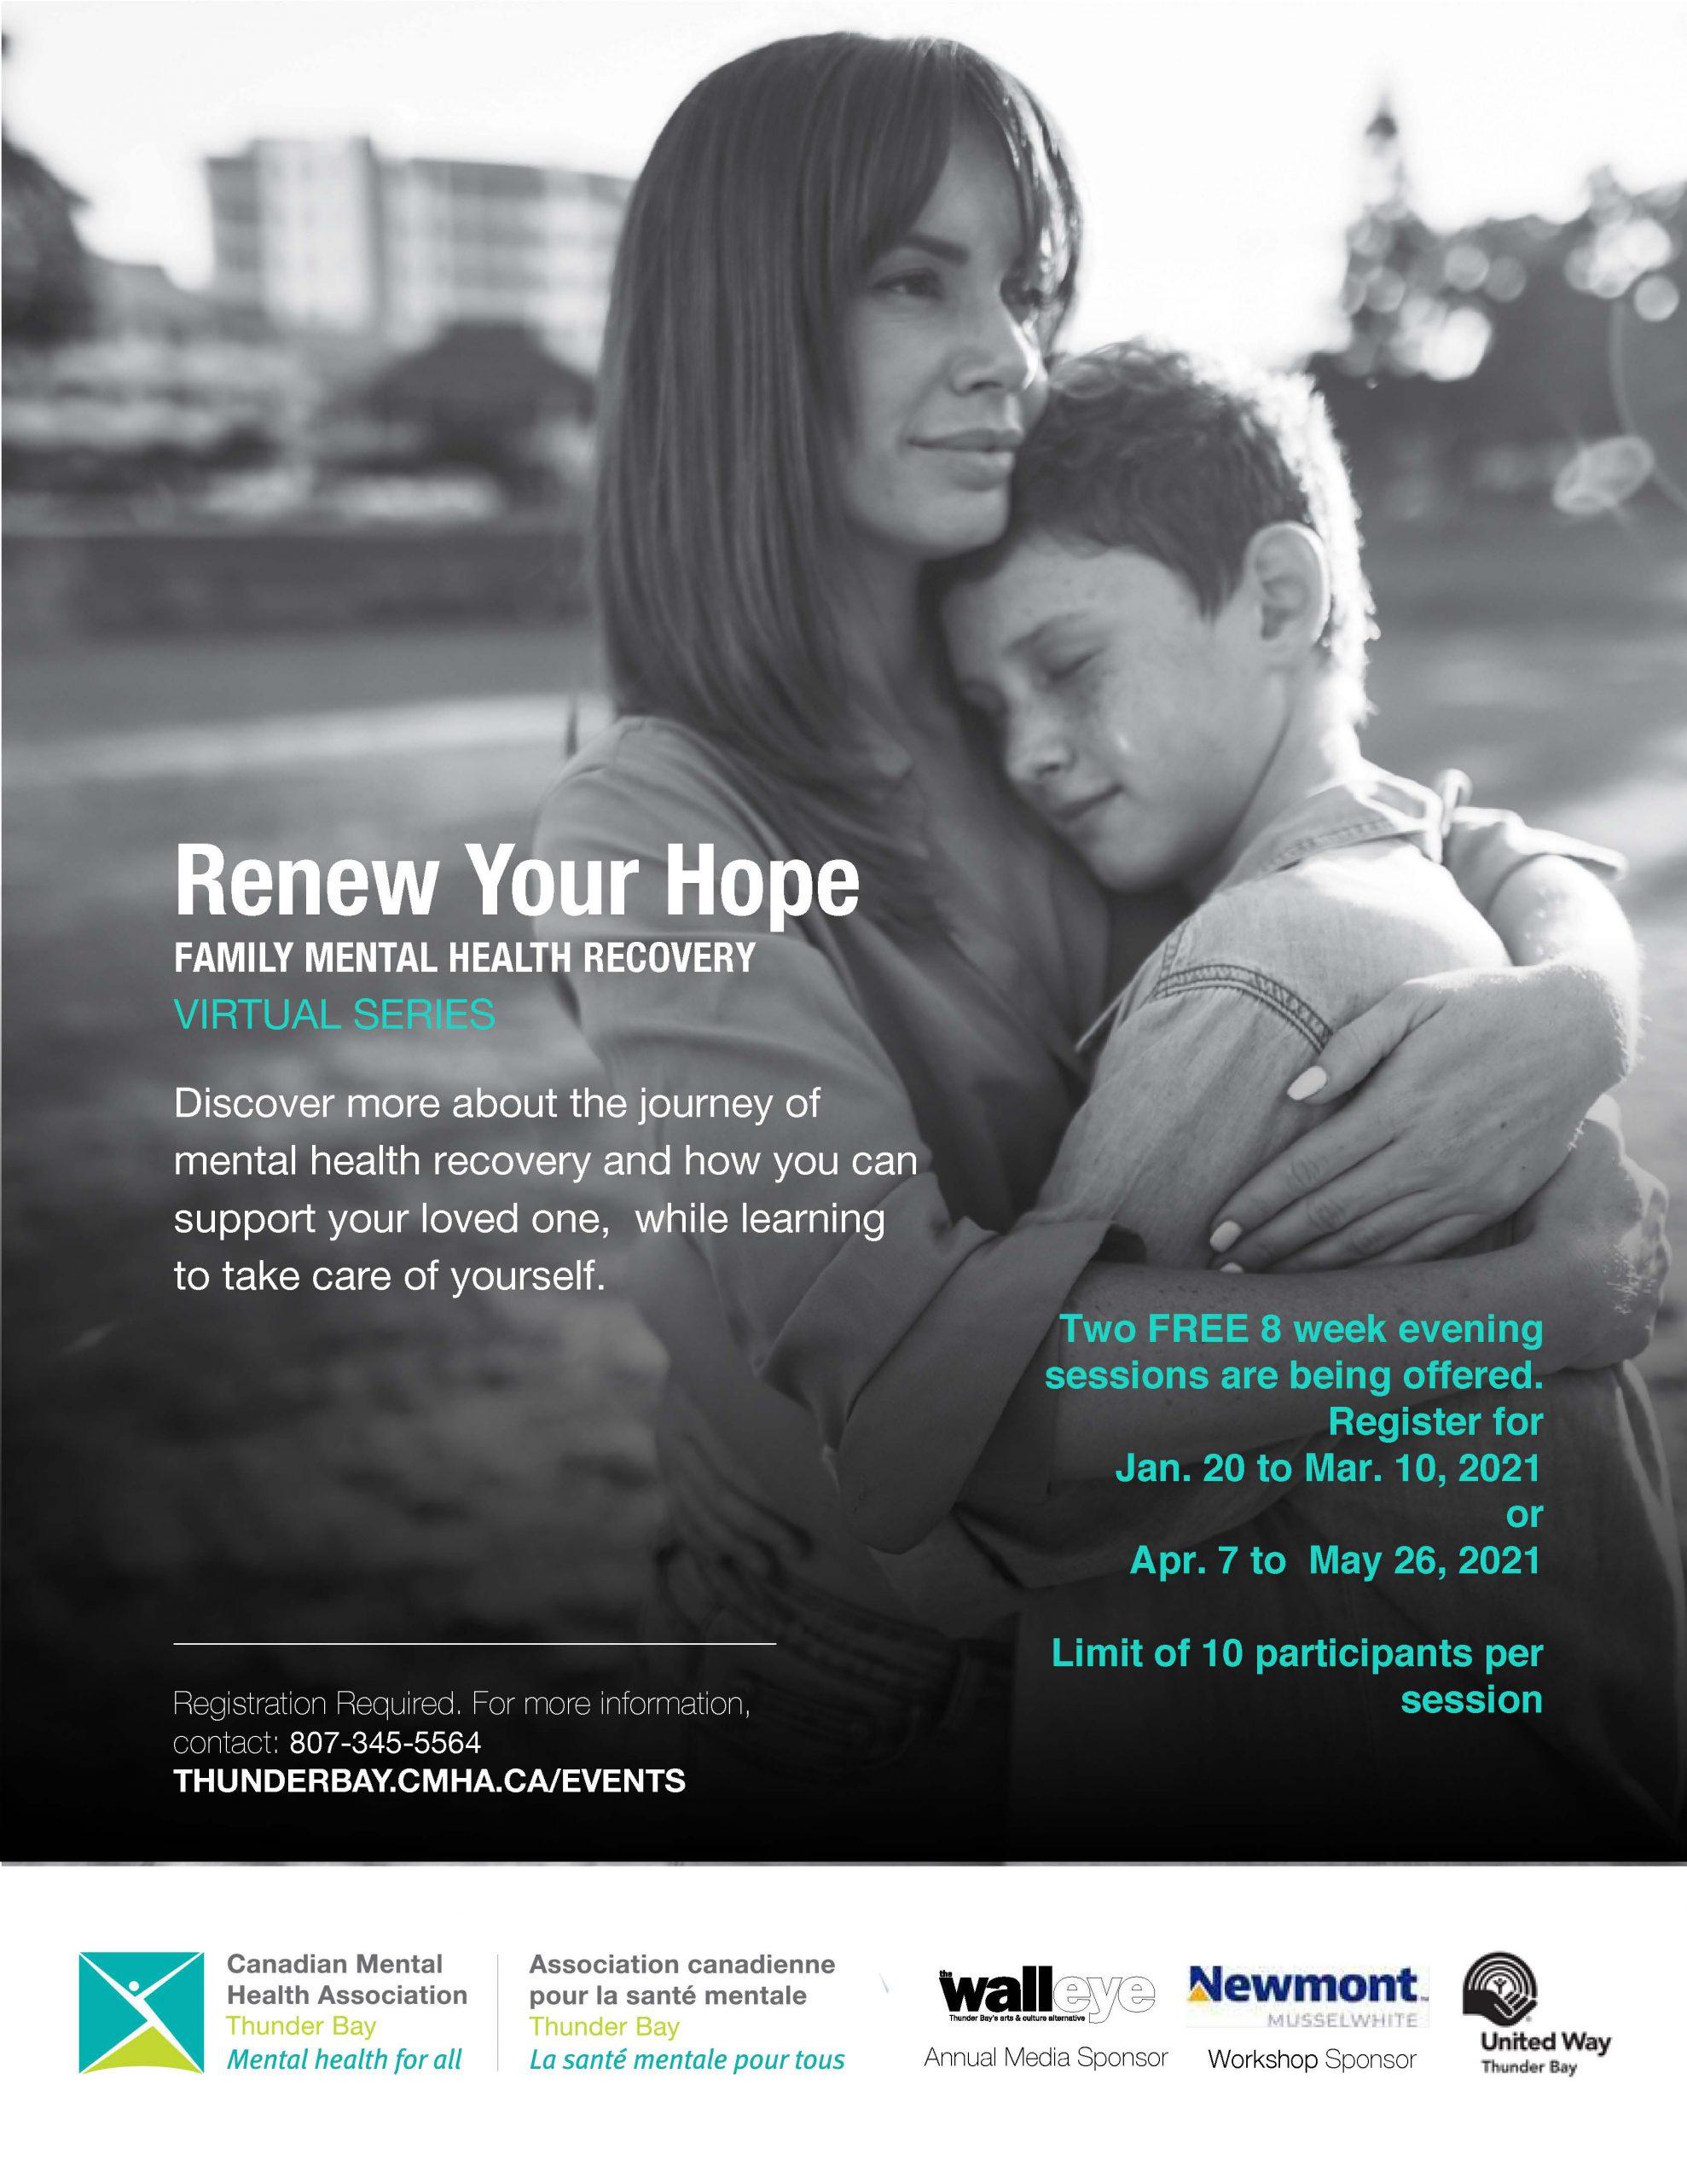 Virtaul Family Mental Health Group Poster